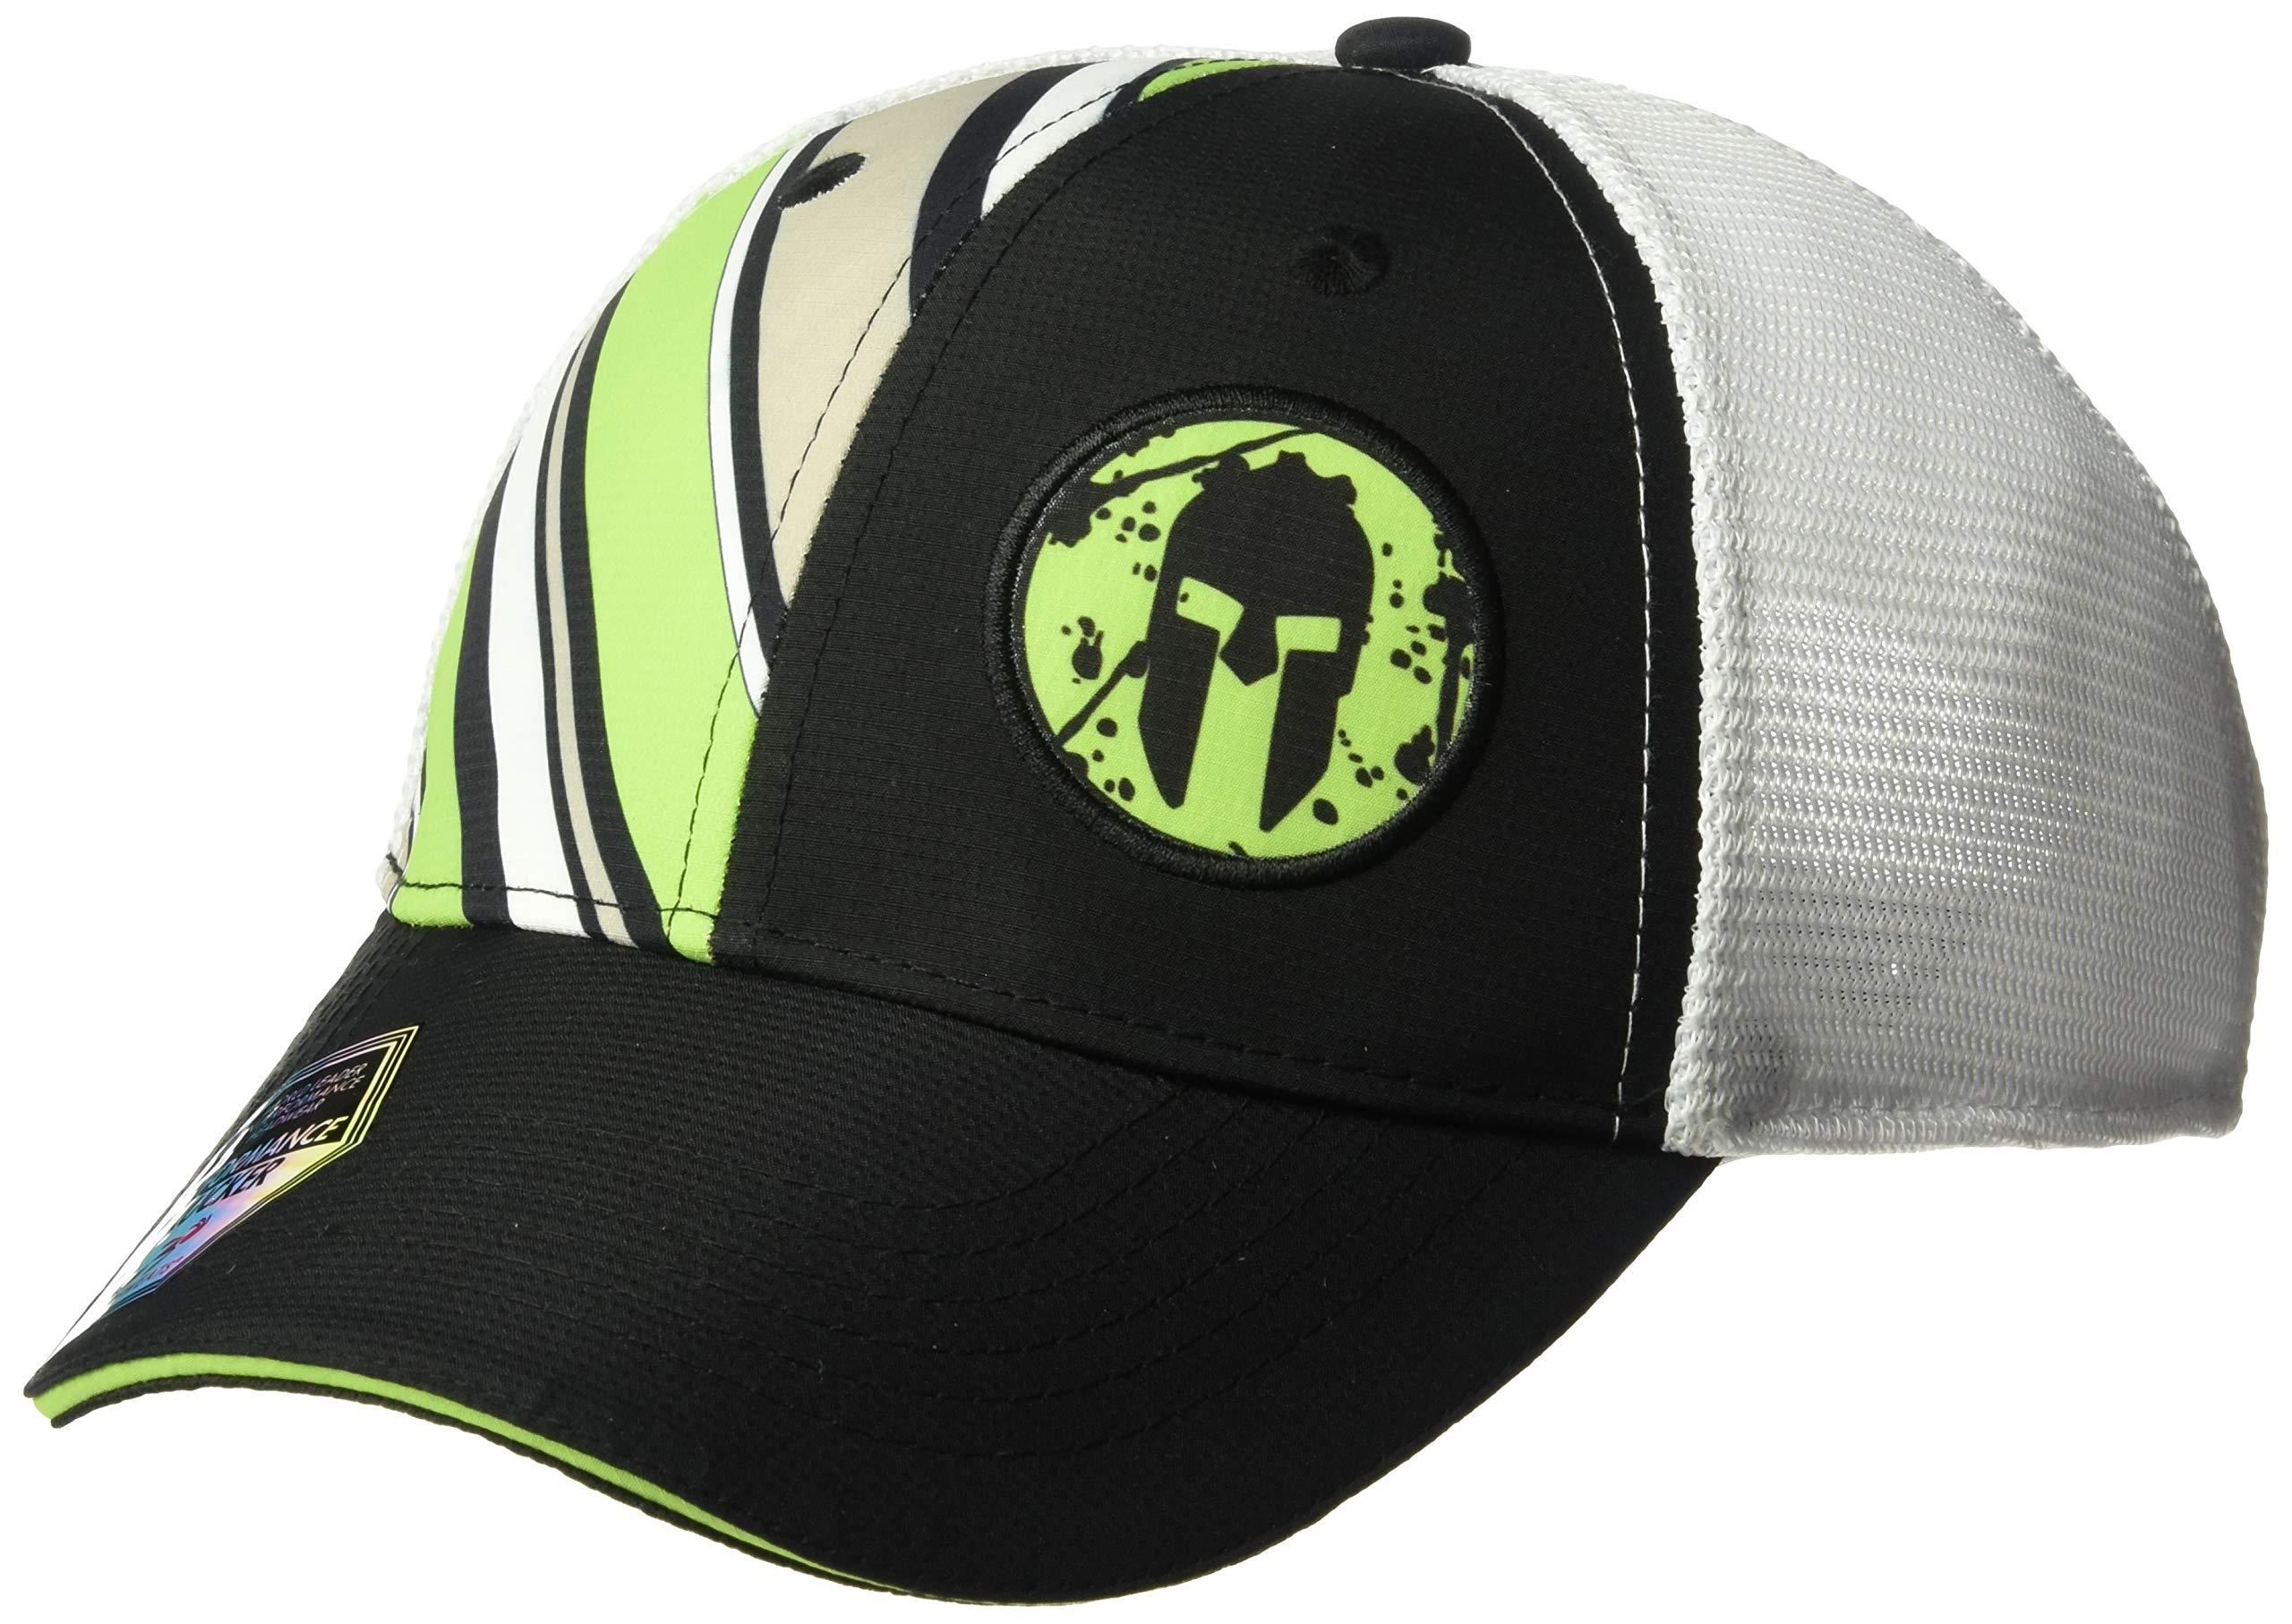 Headsweats Performance Trucker Hat, Green Stripes, One Size